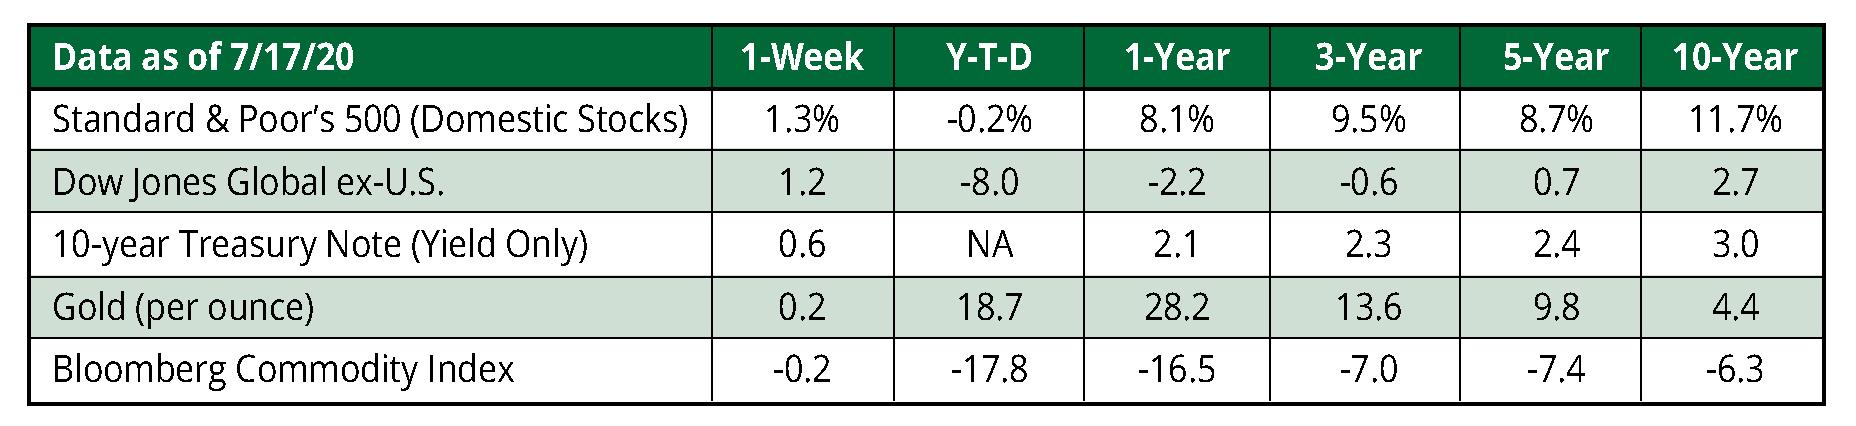 KWB Wealth | Redlands, CA: 7/20 WMC chart